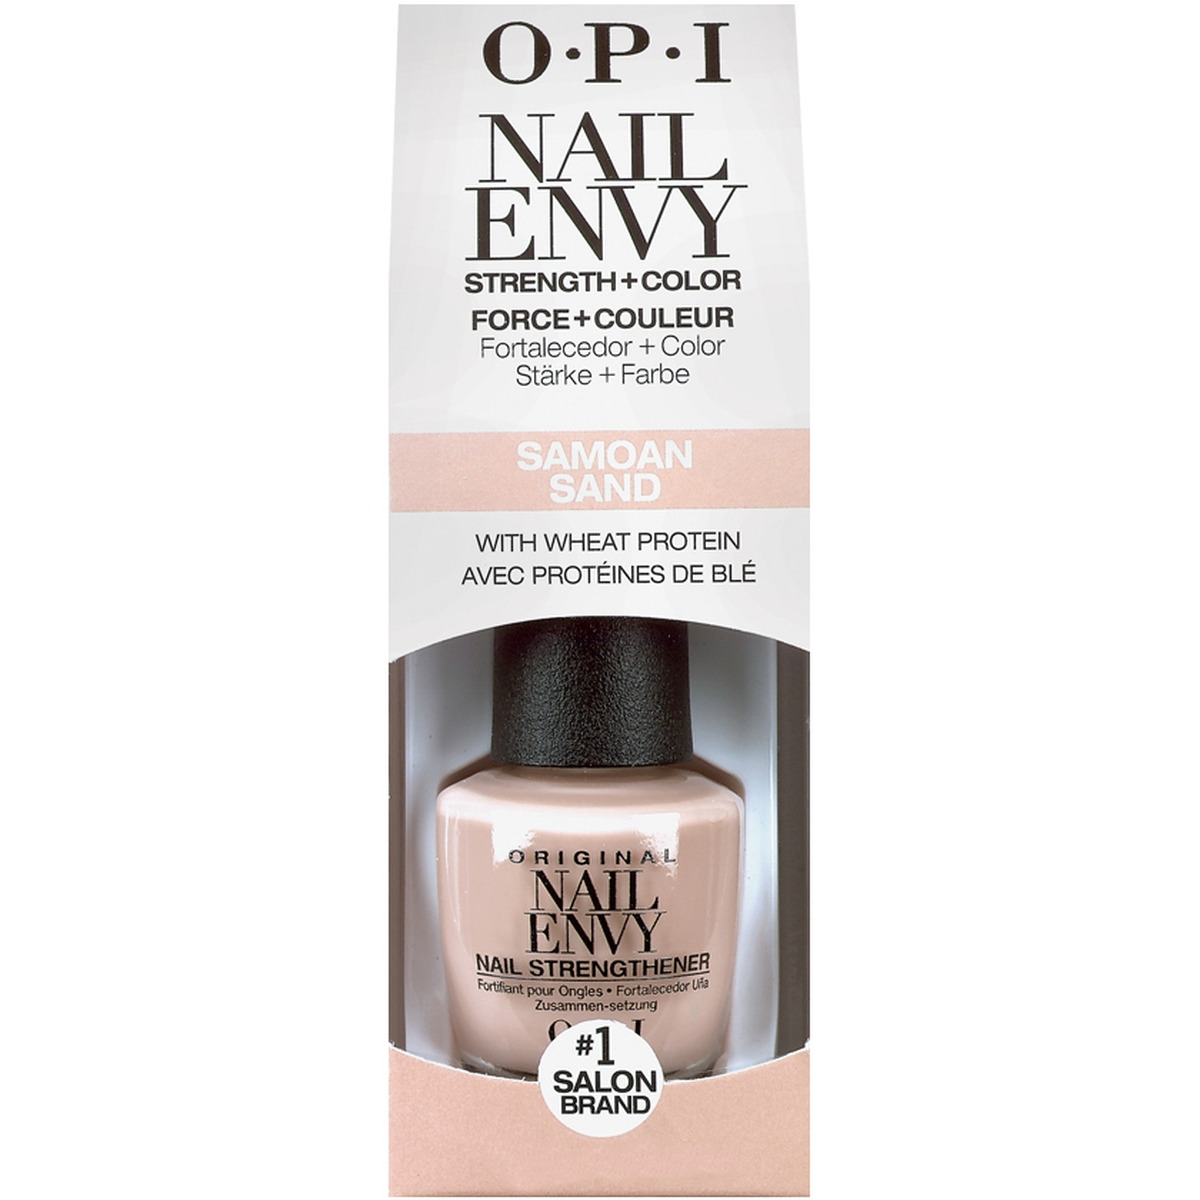 Покрытие лечебное OPI Original Nail Envy Samoan Sand, 15 мл opi nail envy sensitive